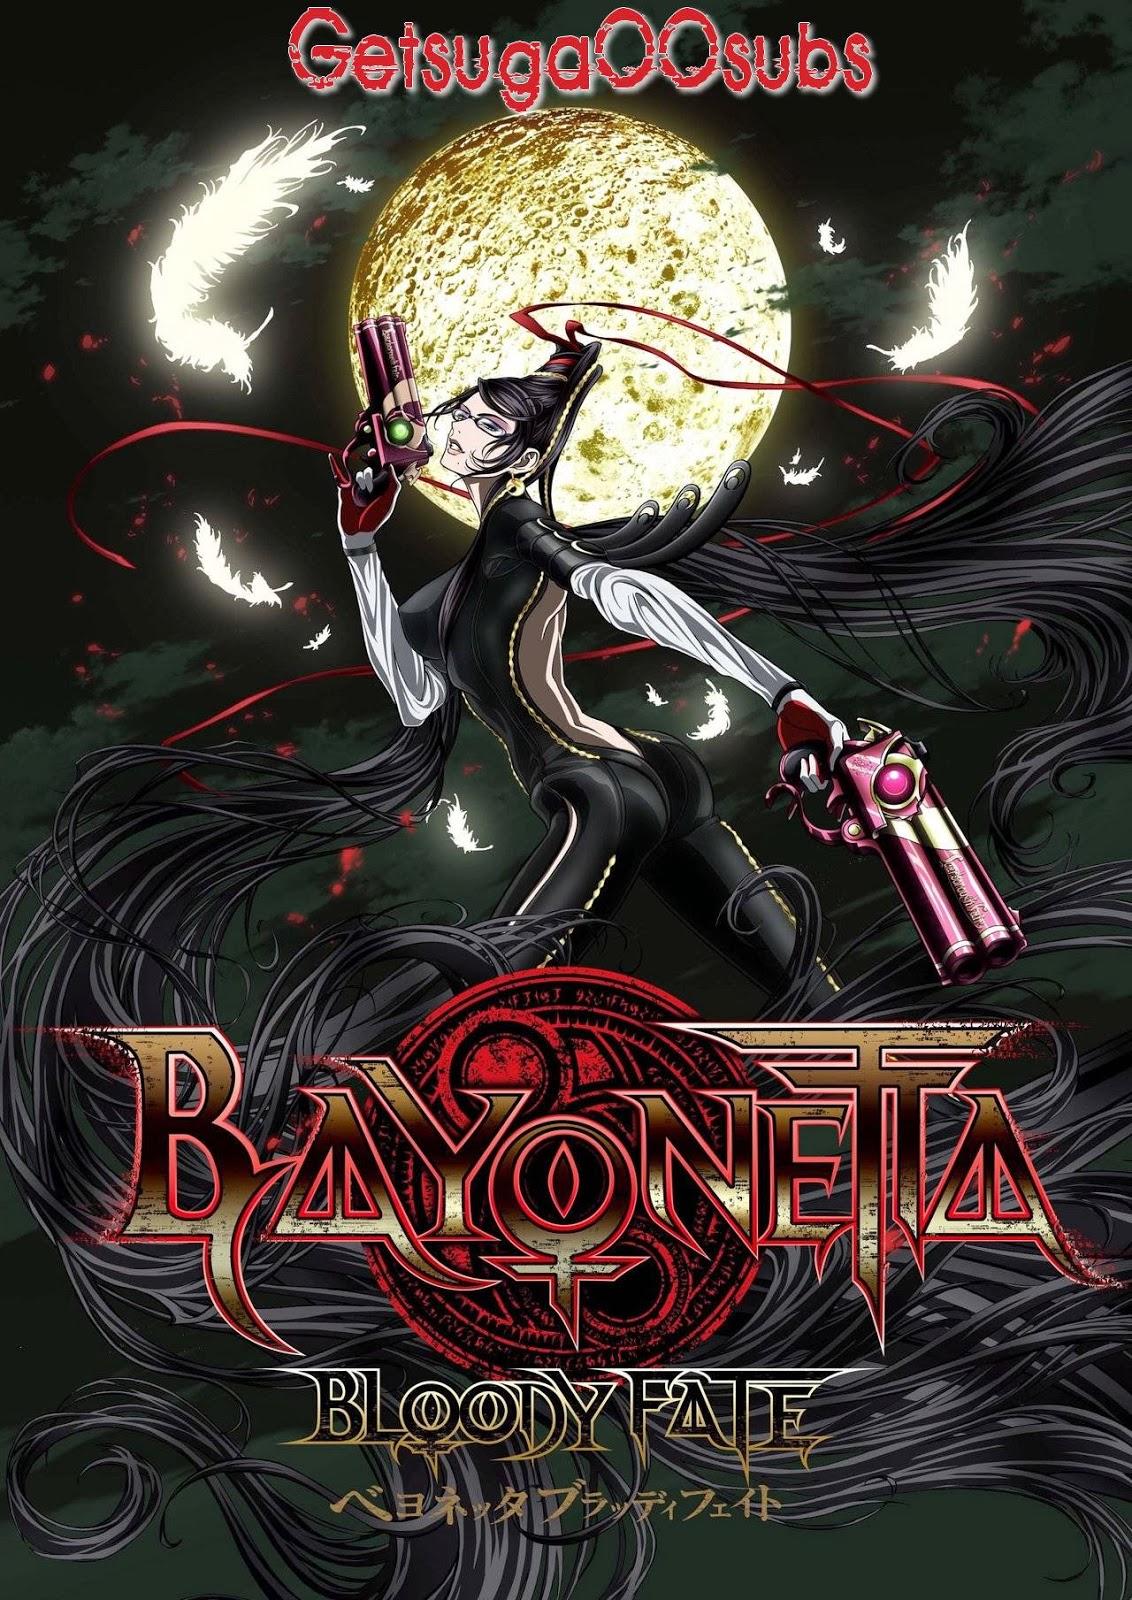 http://getsuga00subs.blogspot.com/2014/03/bayonetta-bloody-fate-2013-bd-720p-373.html